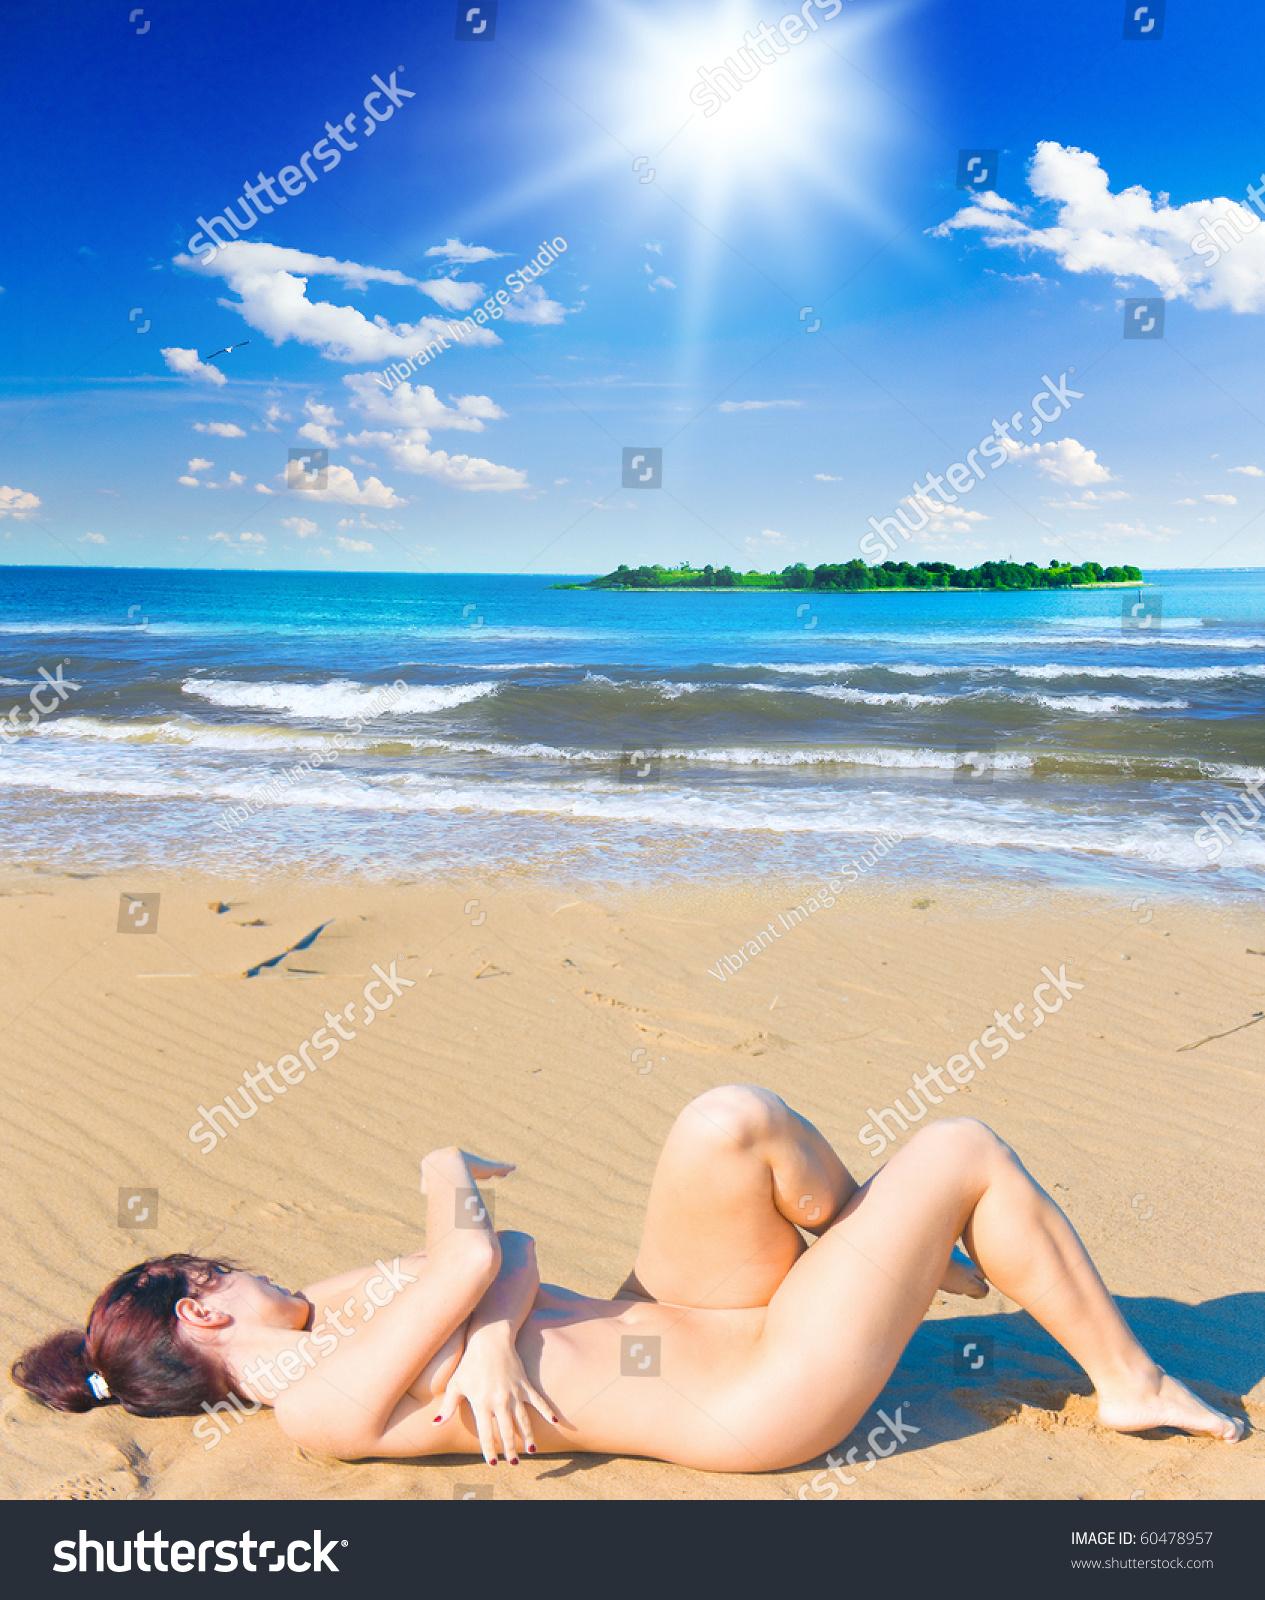 Nudist Beach Posing Stock Photo Edit Now 60478957